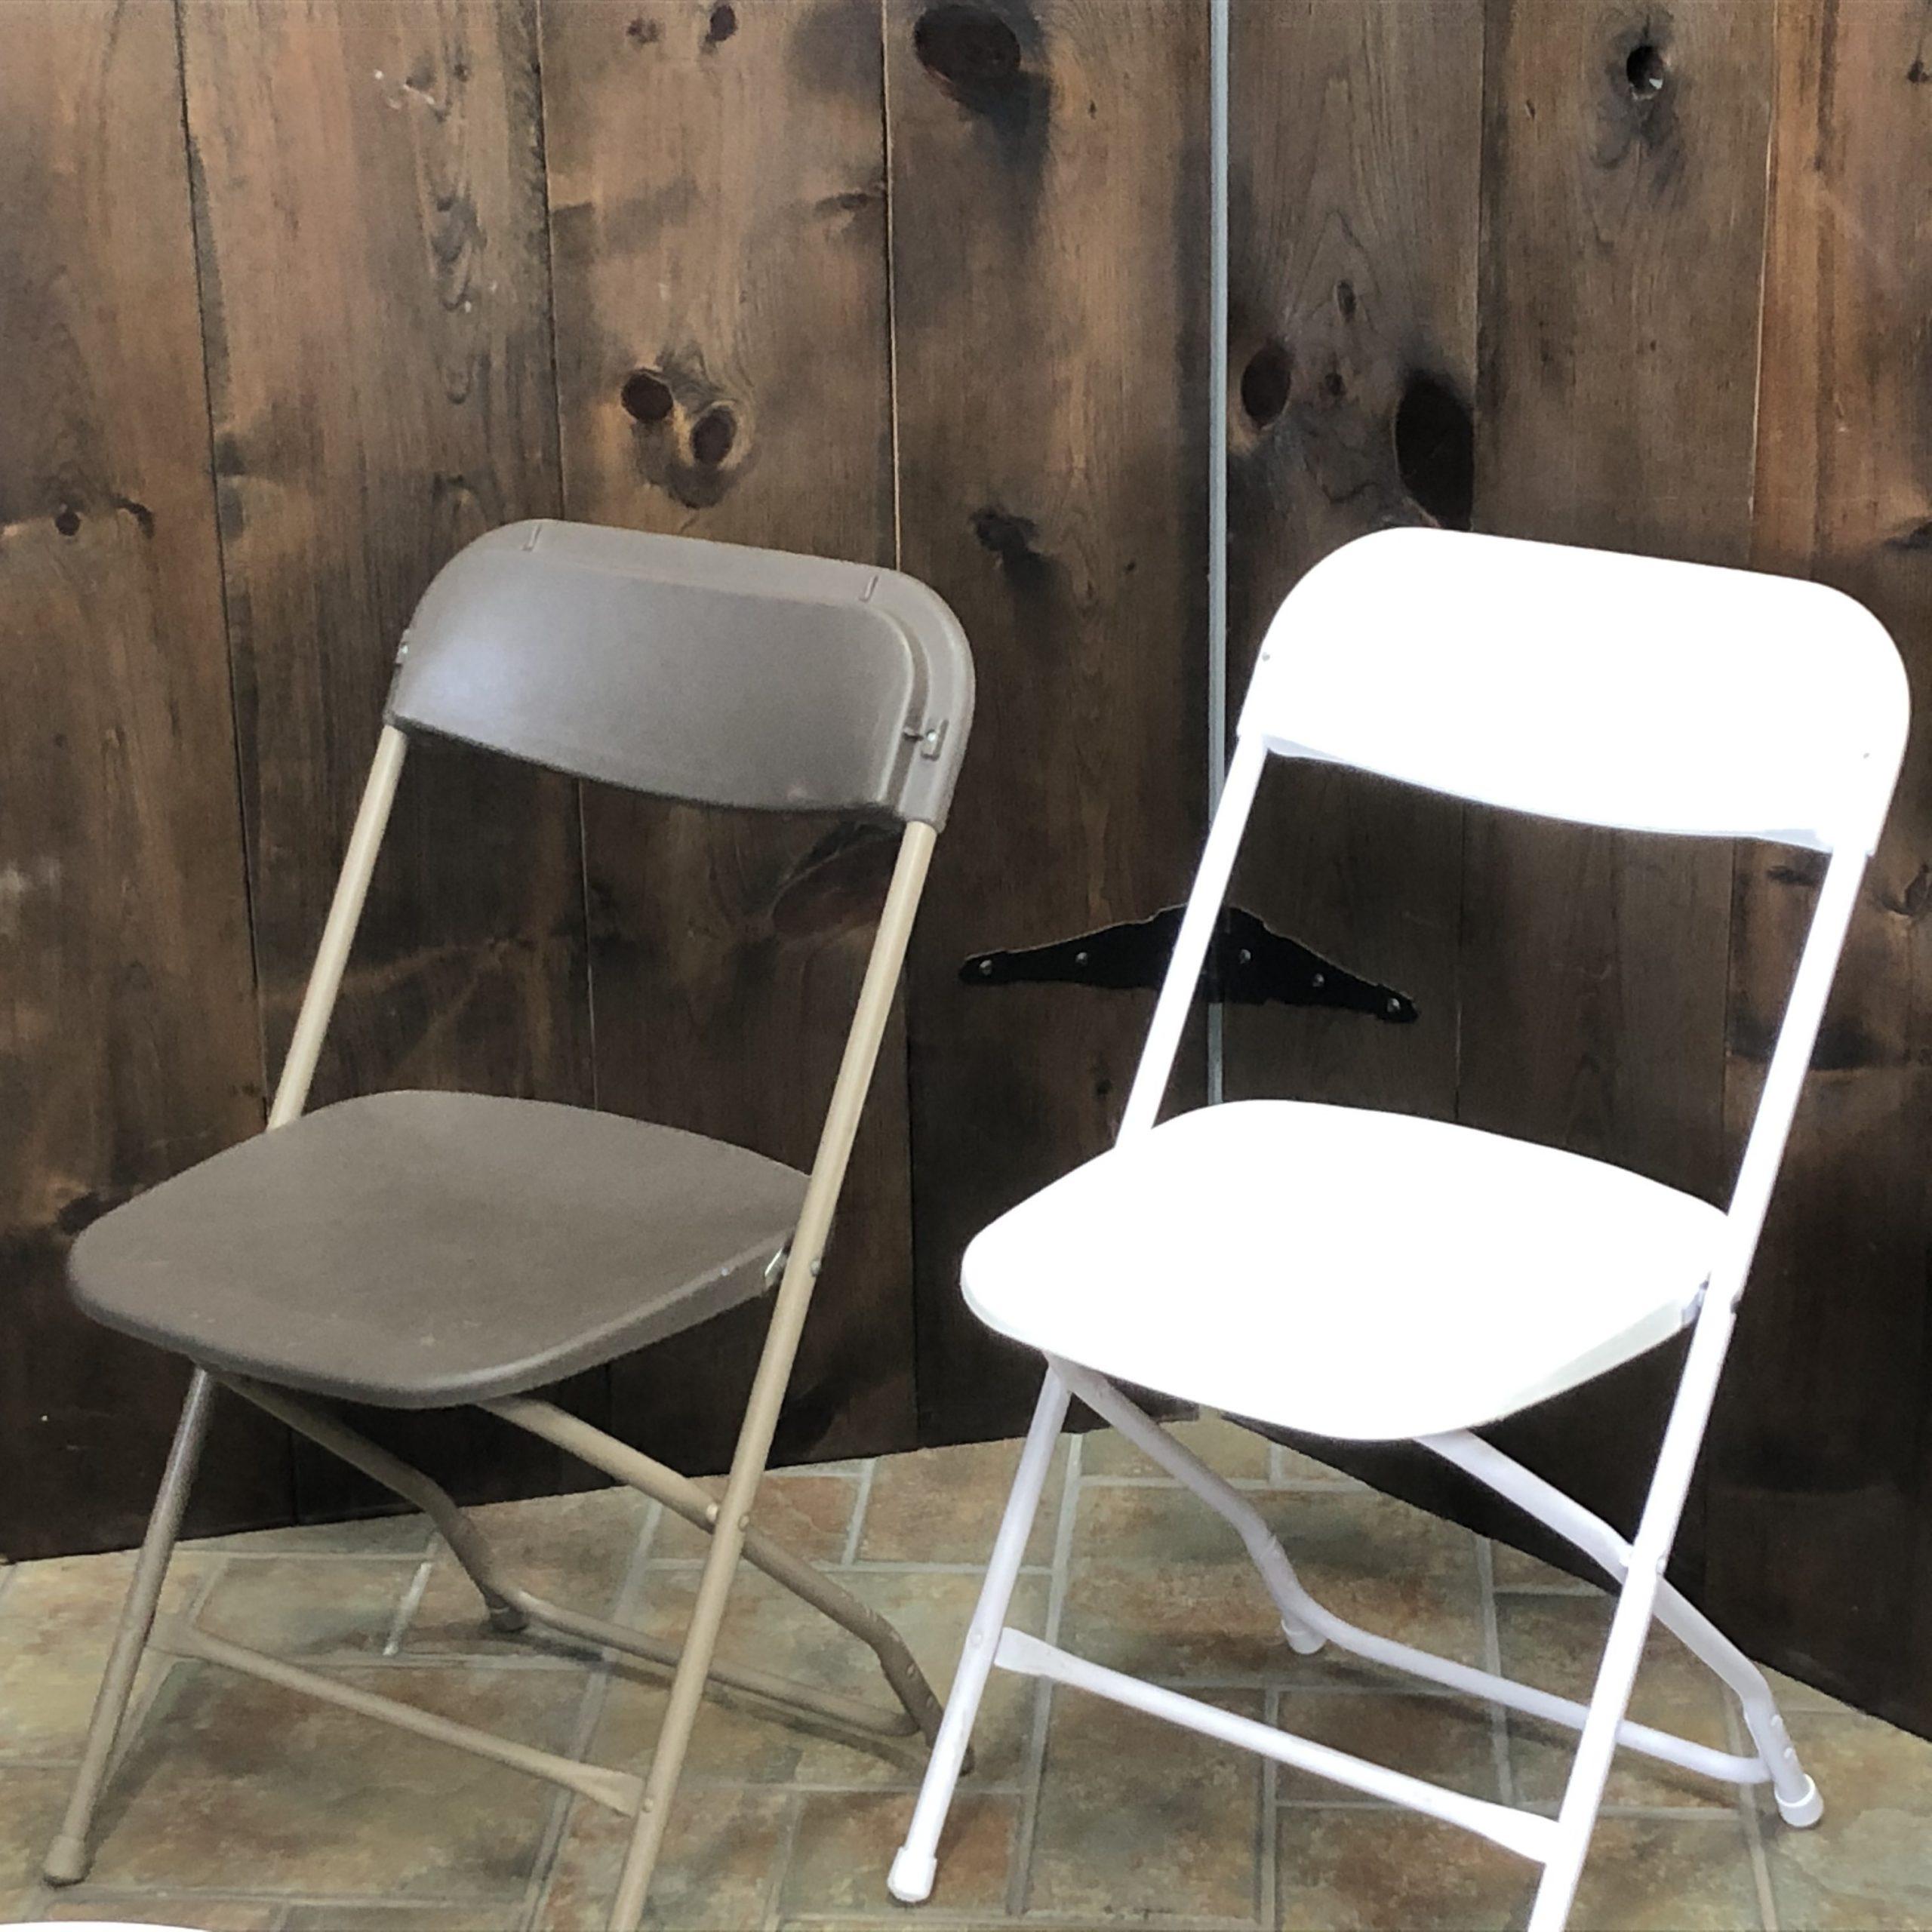 Folding Chairs Image